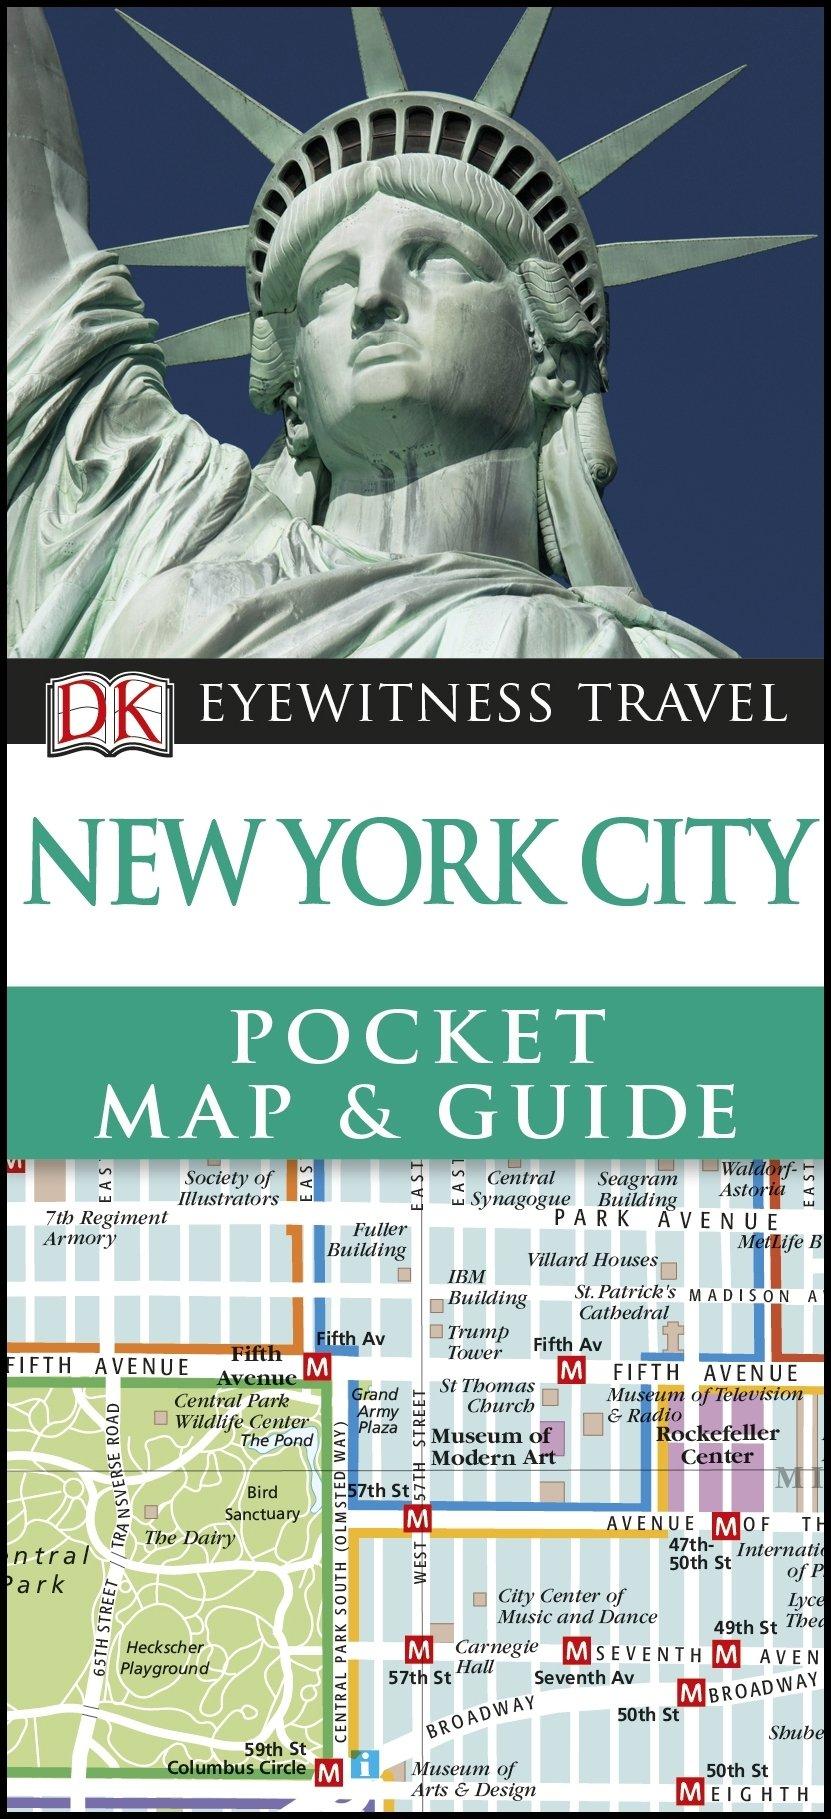 DK Eyewitness Pocket Map Guide product image